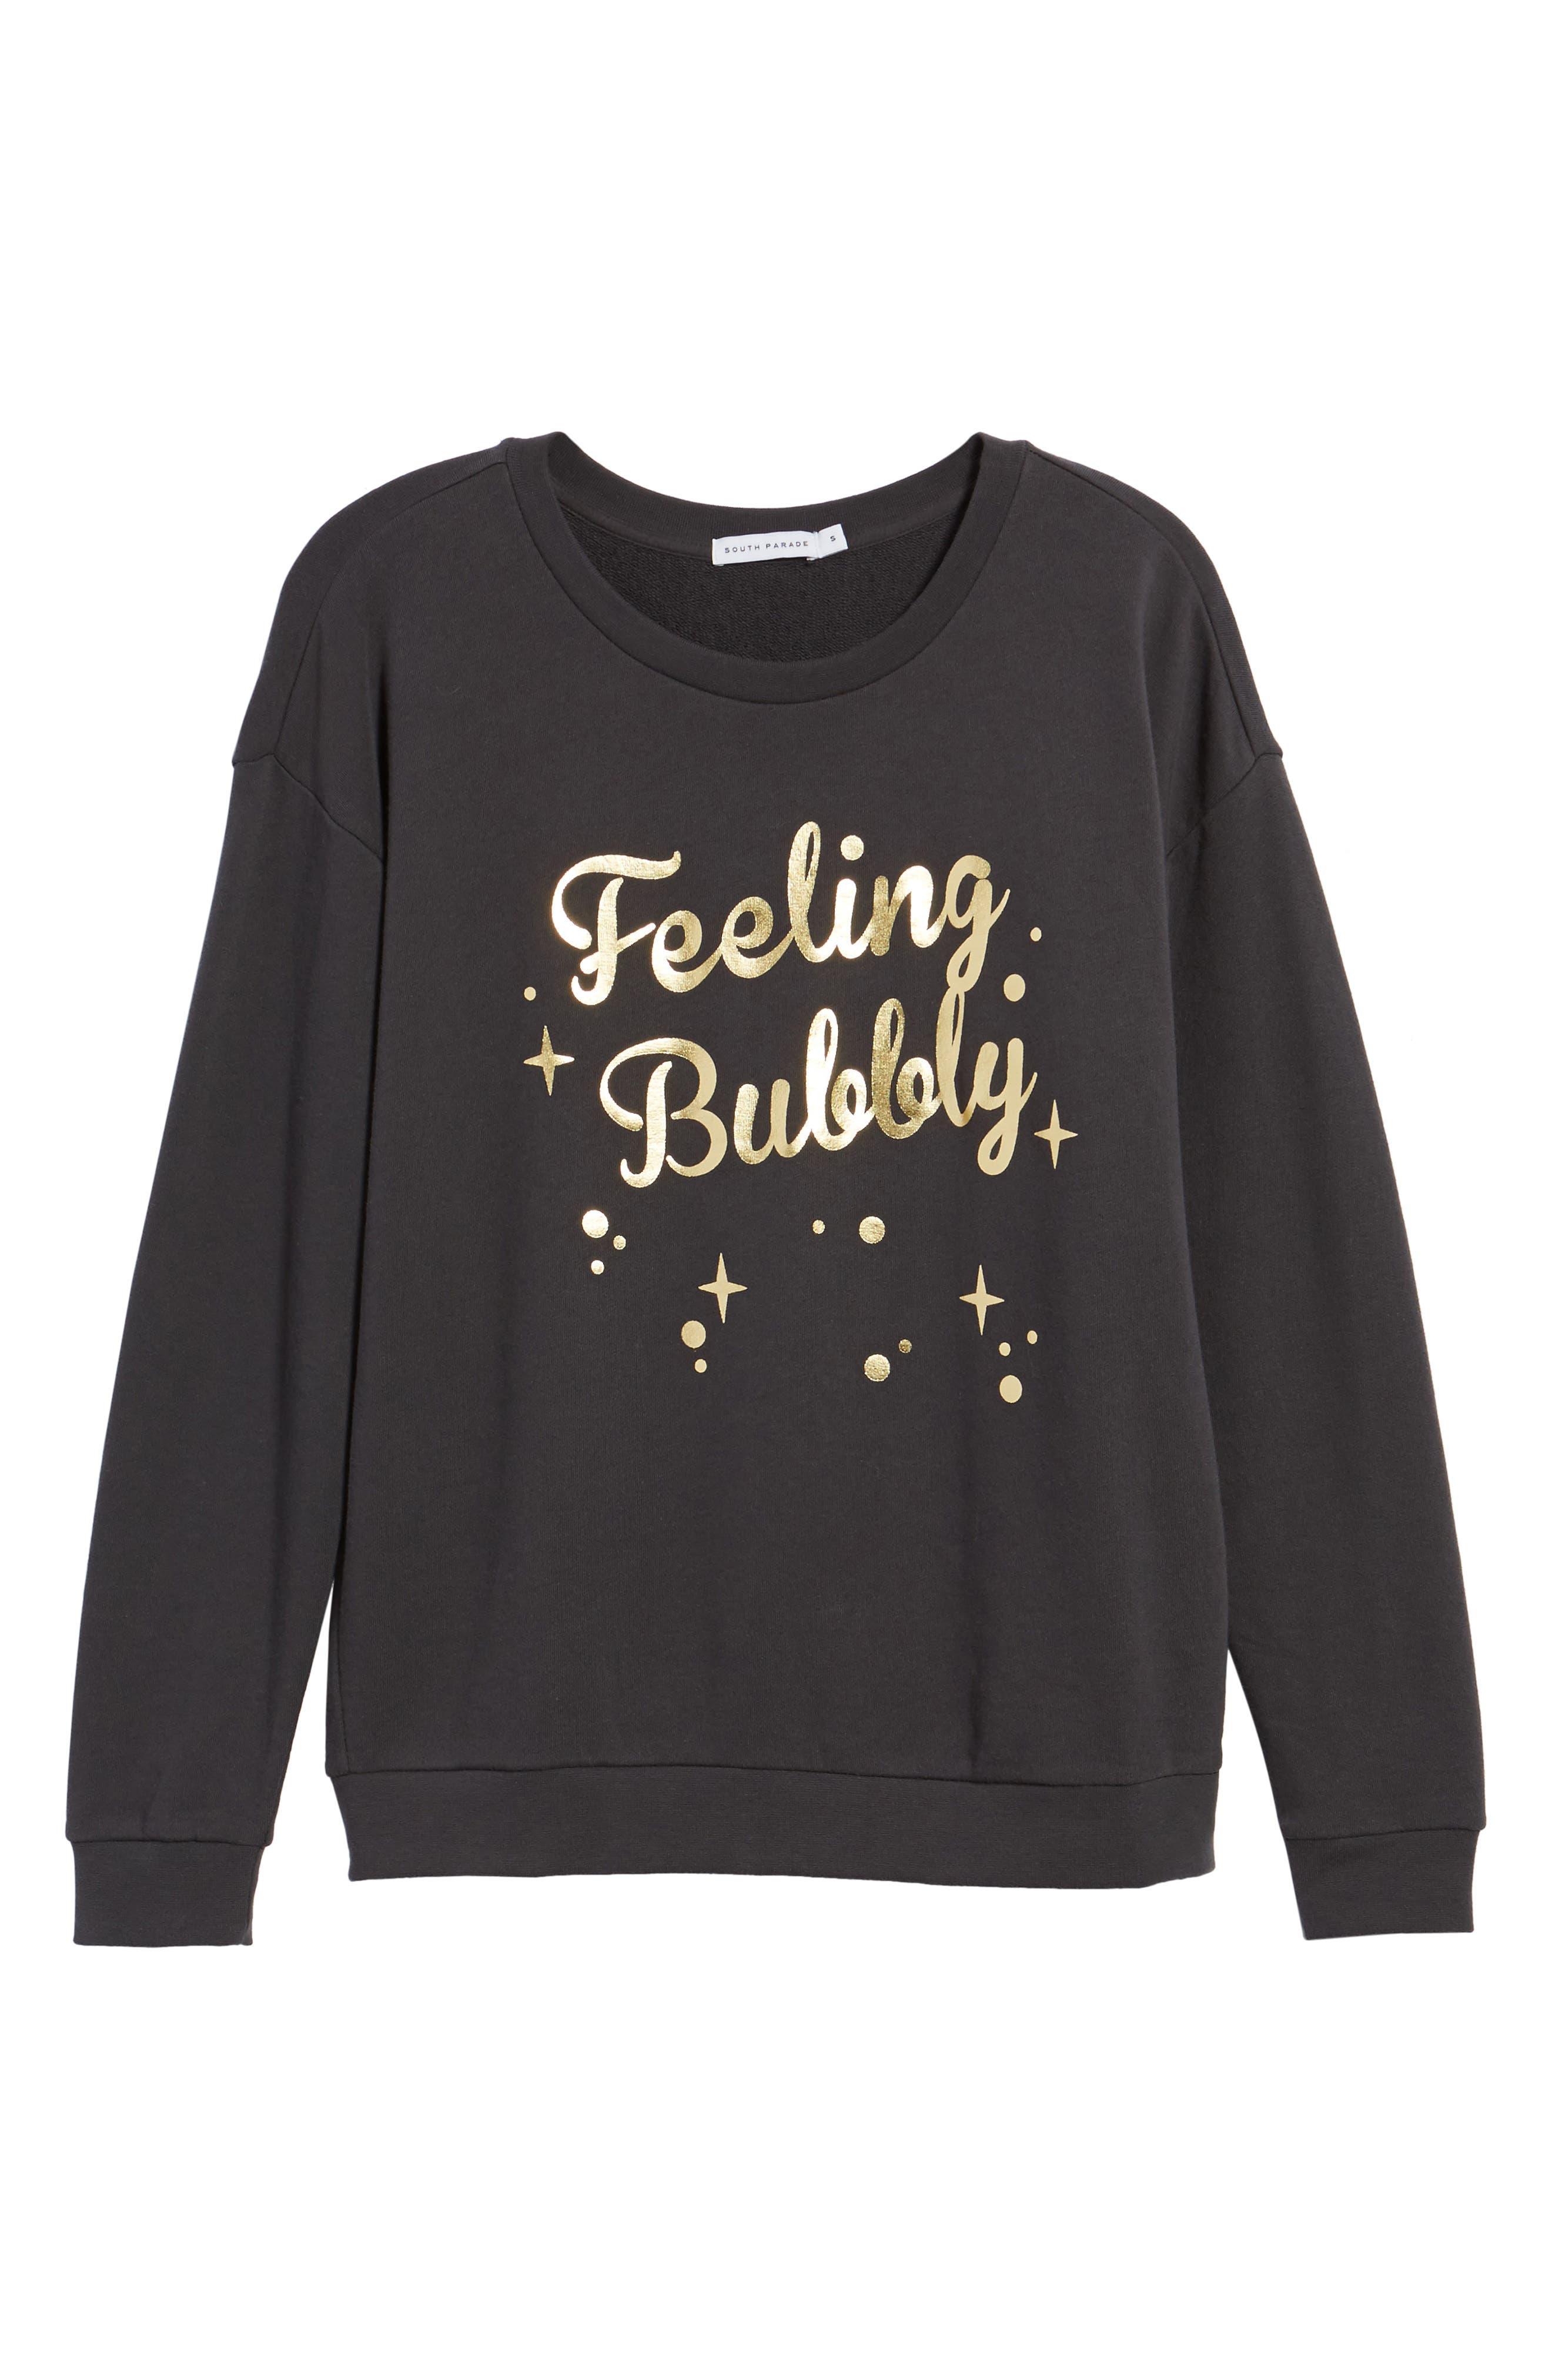 Feeling Bubbly Sweatshirt,                             Alternate thumbnail 6, color,                             001